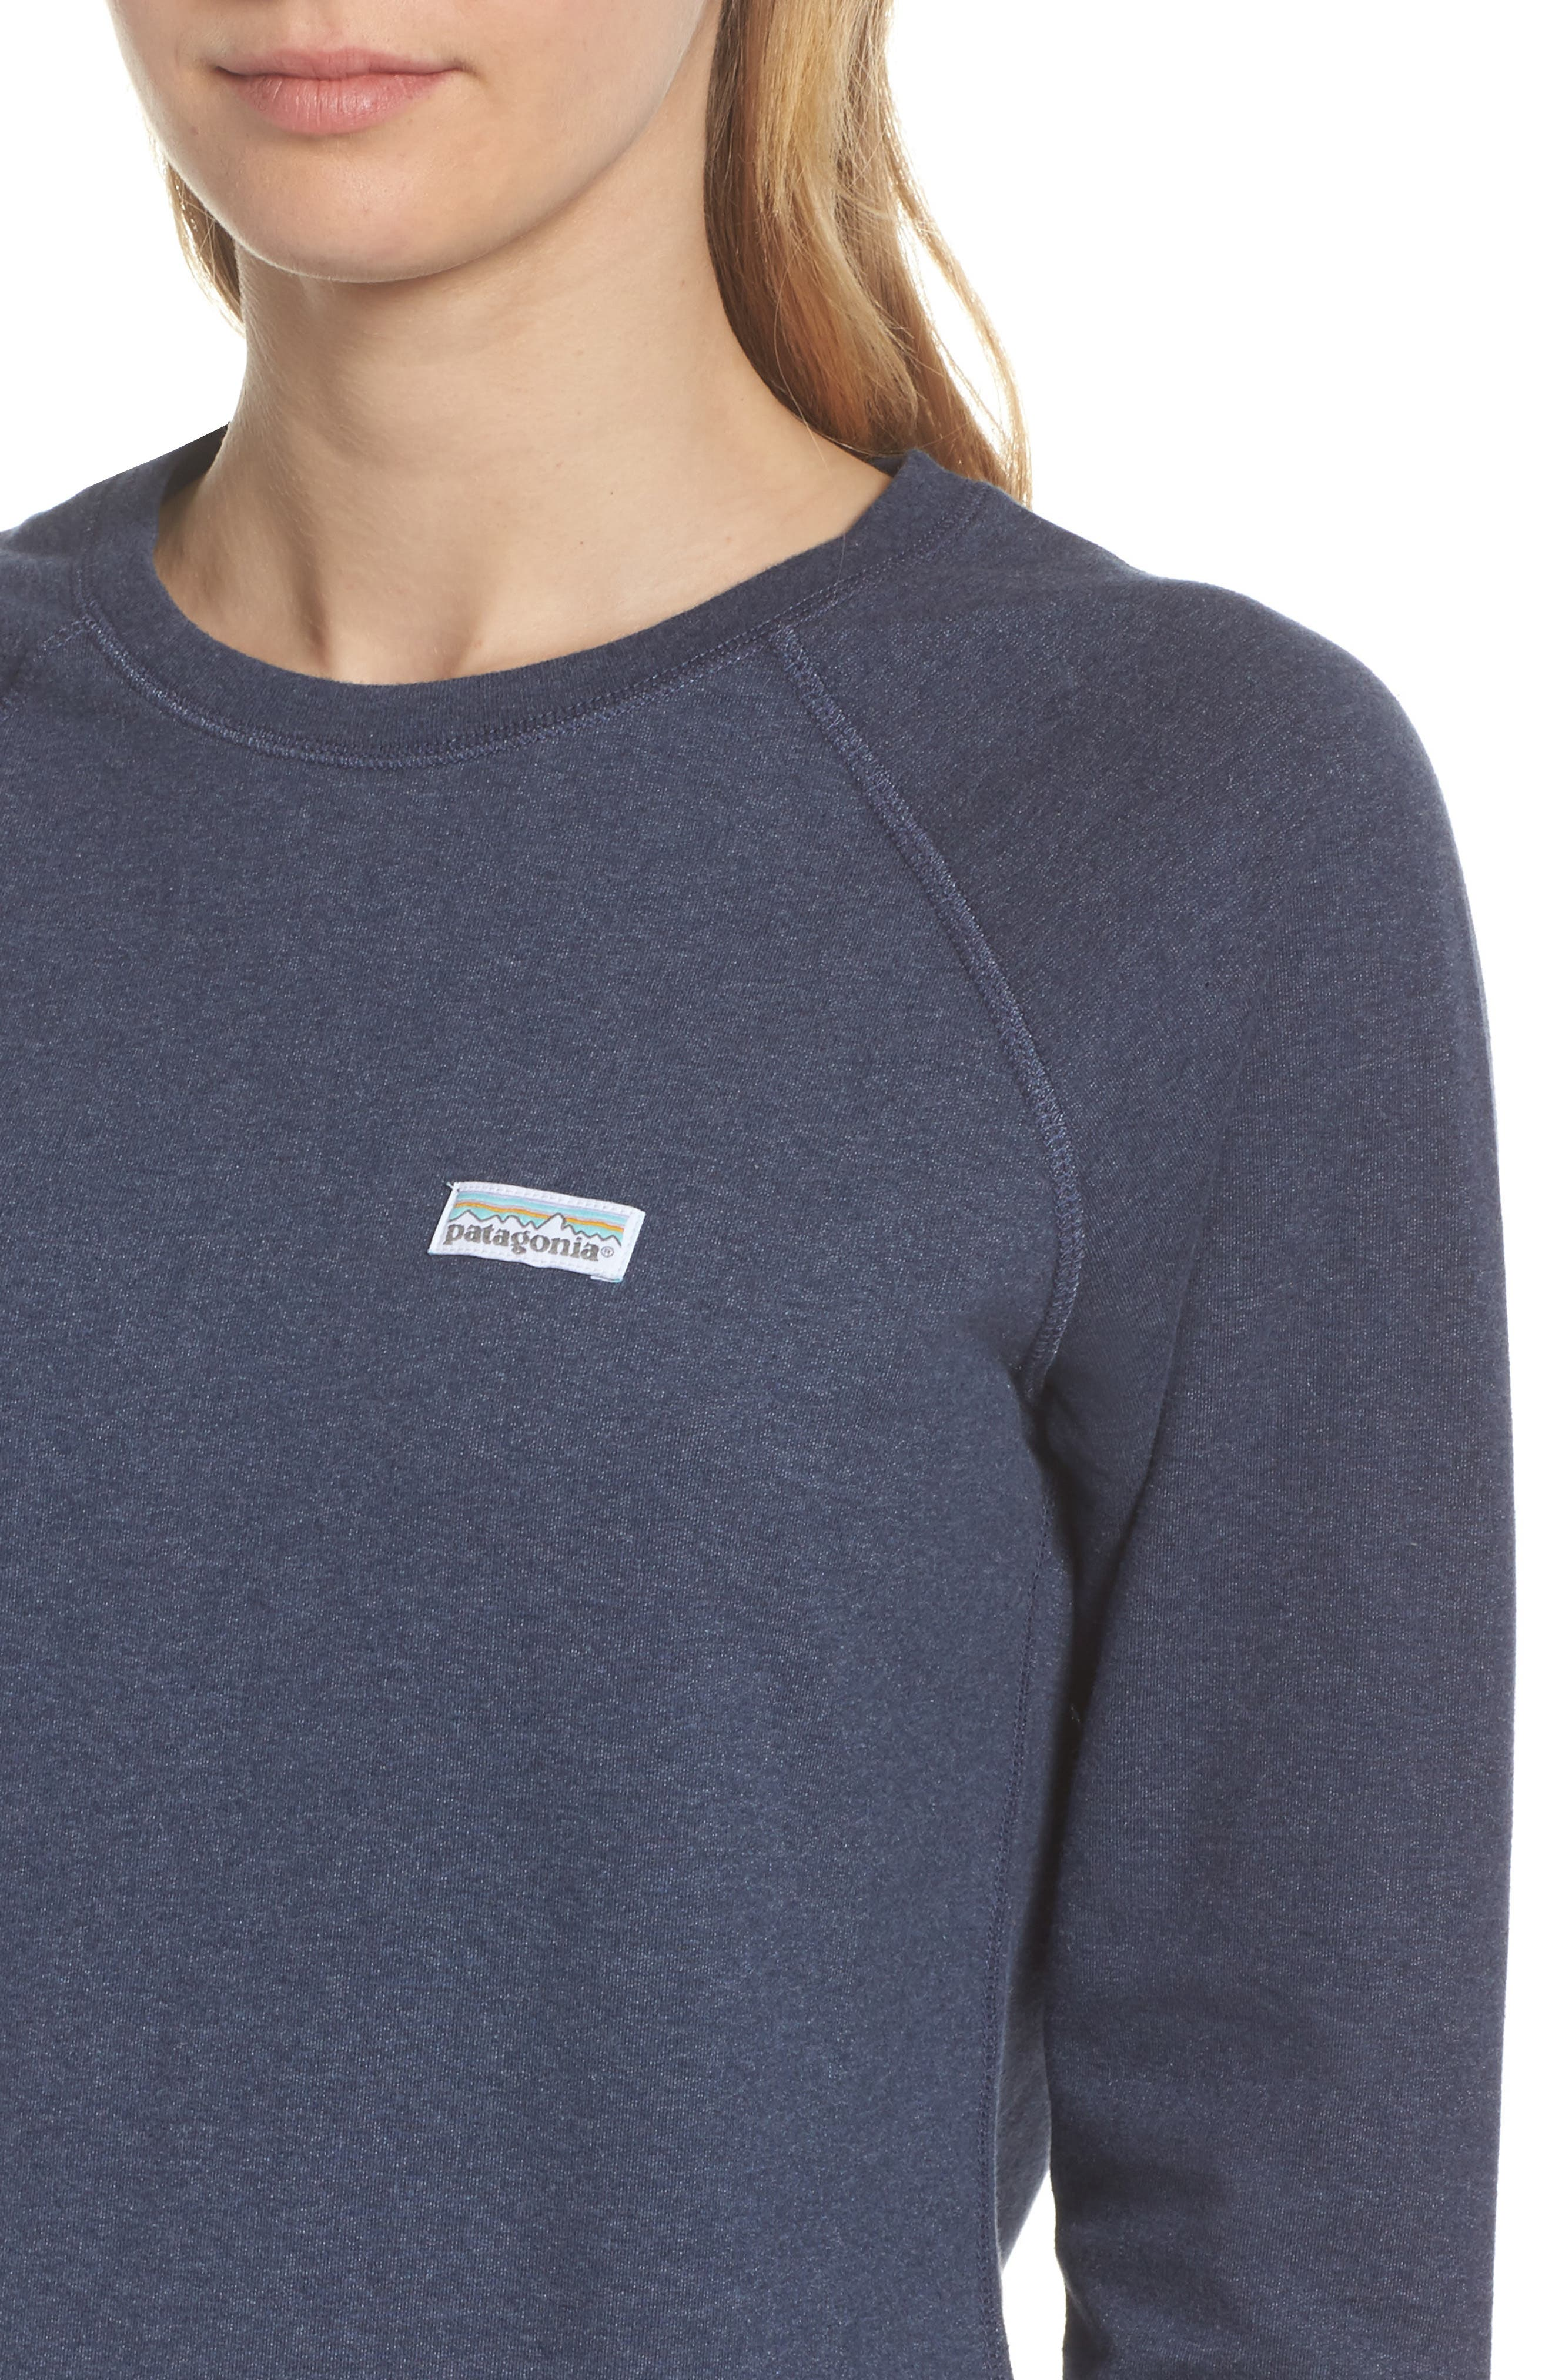 Pastel P-6 Label Midweight Sweatshirt,                             Alternate thumbnail 4, color,                             Classic Navy